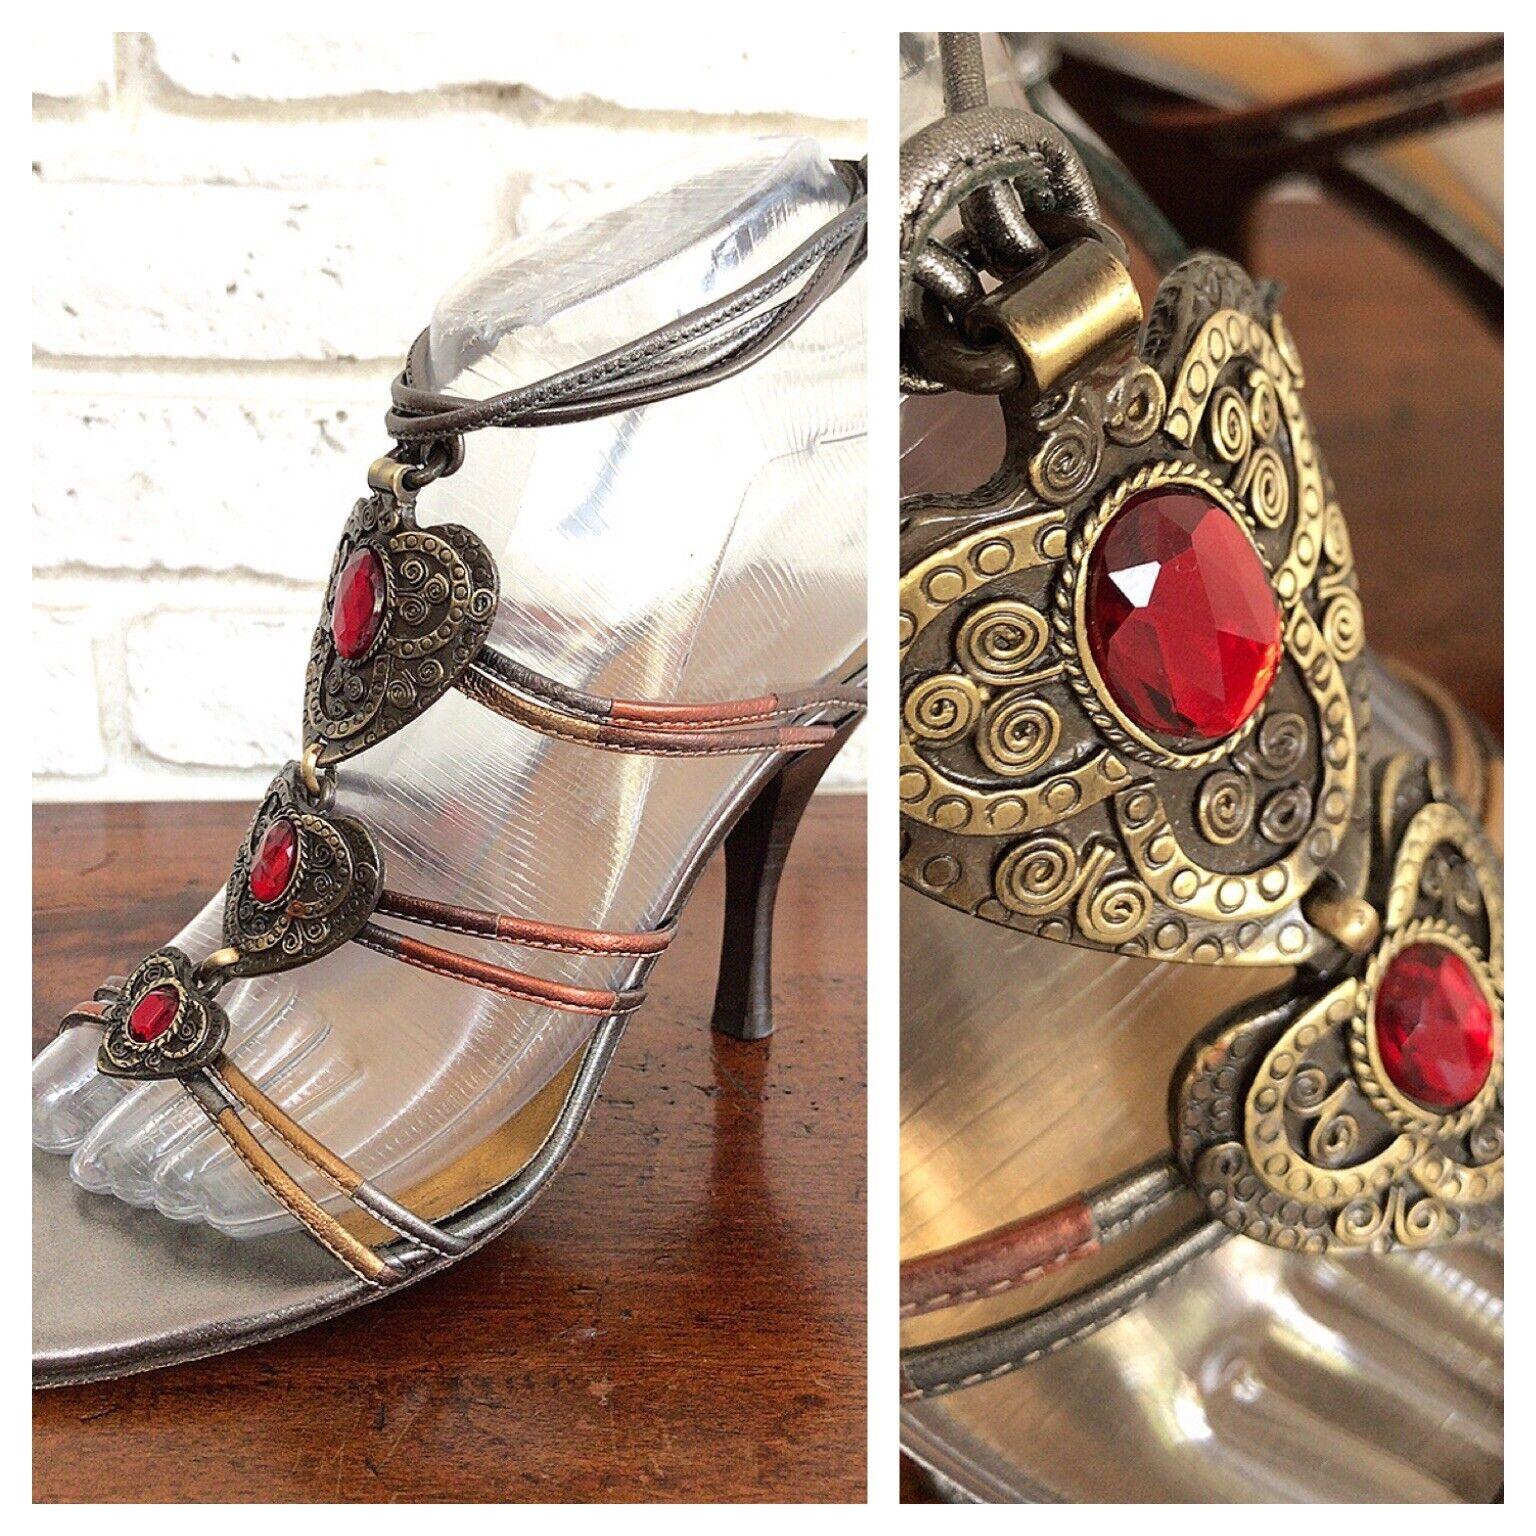 96ce3107f0f J Pliner Metallic Bronze gold Leather Strappy Heel Sandals W ...